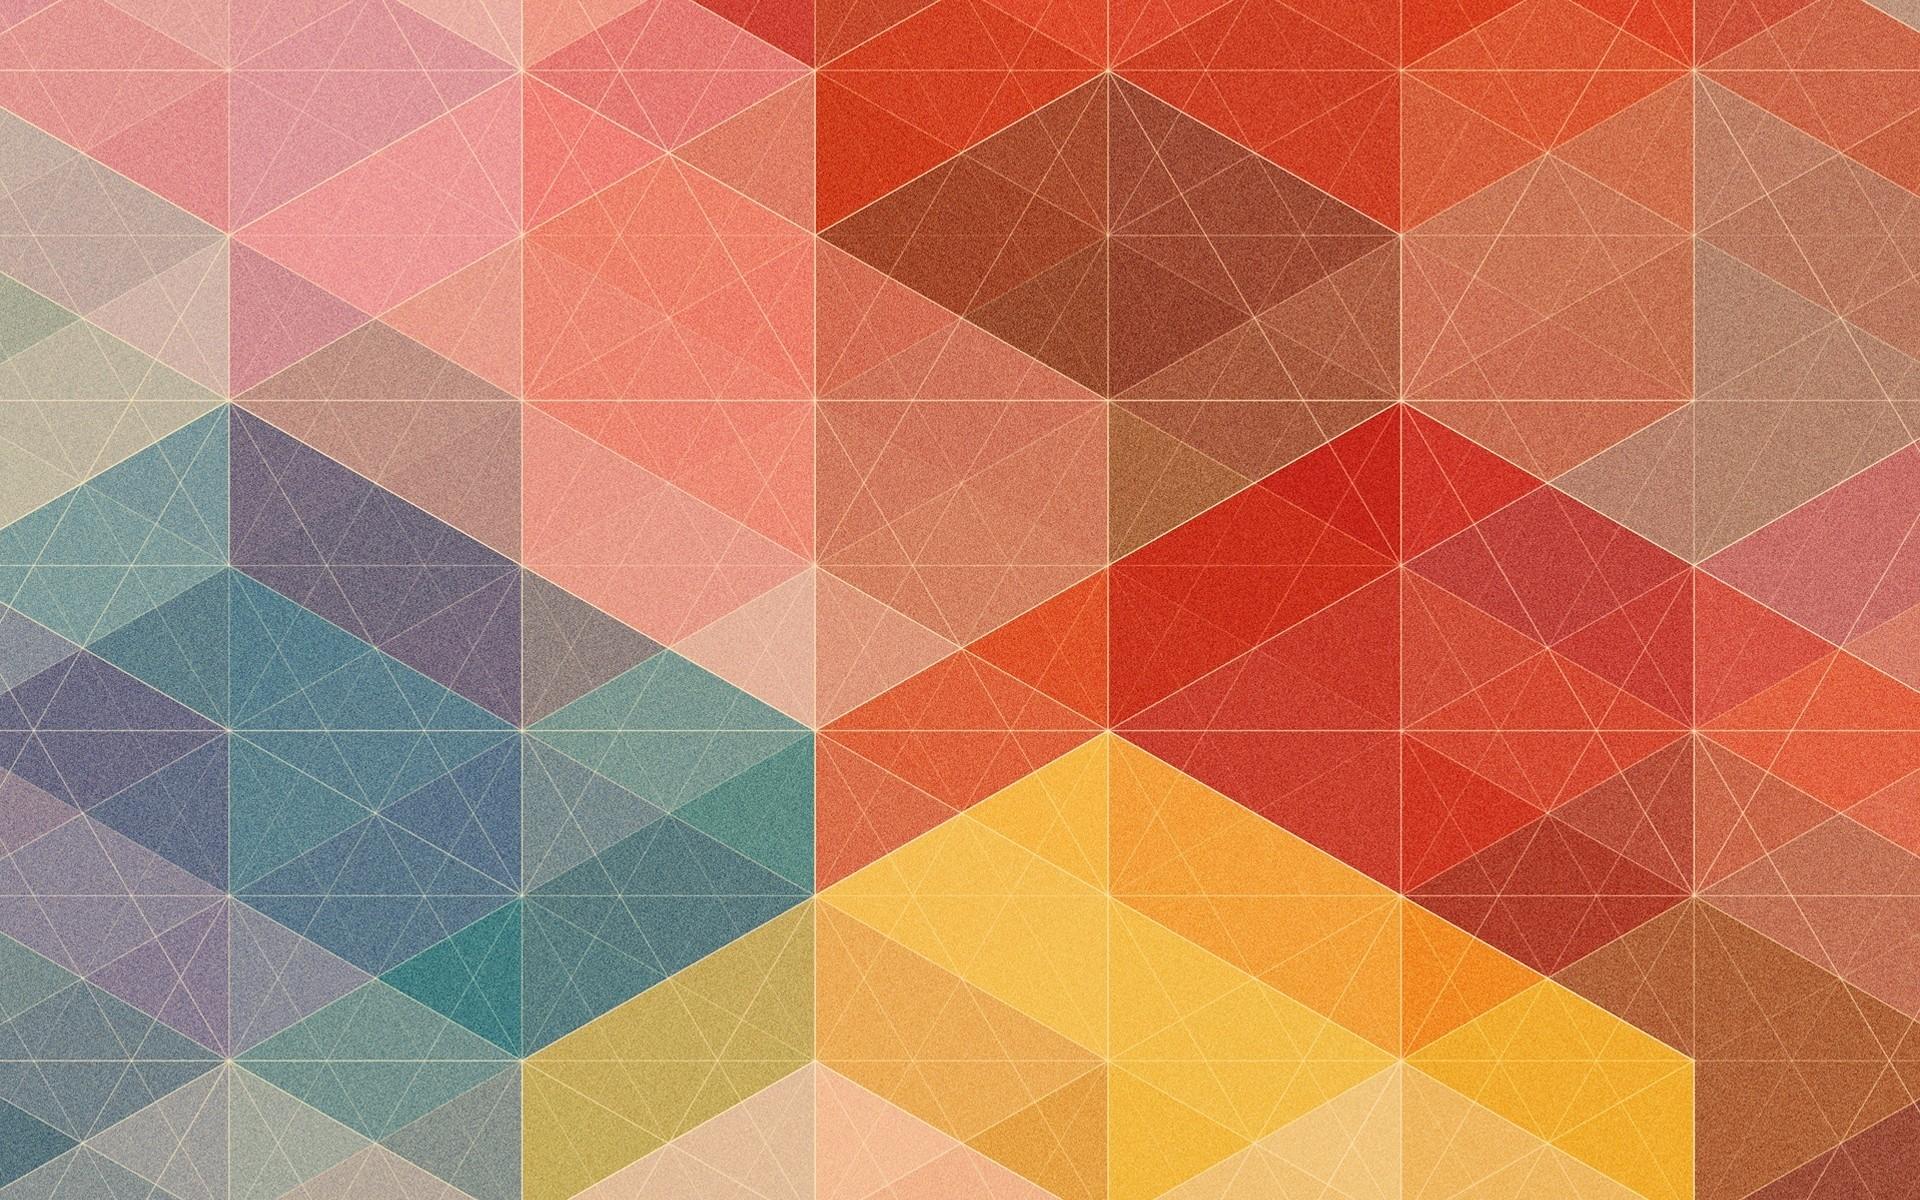 Geometric Shapes Design · Geometric Design Wallpapers